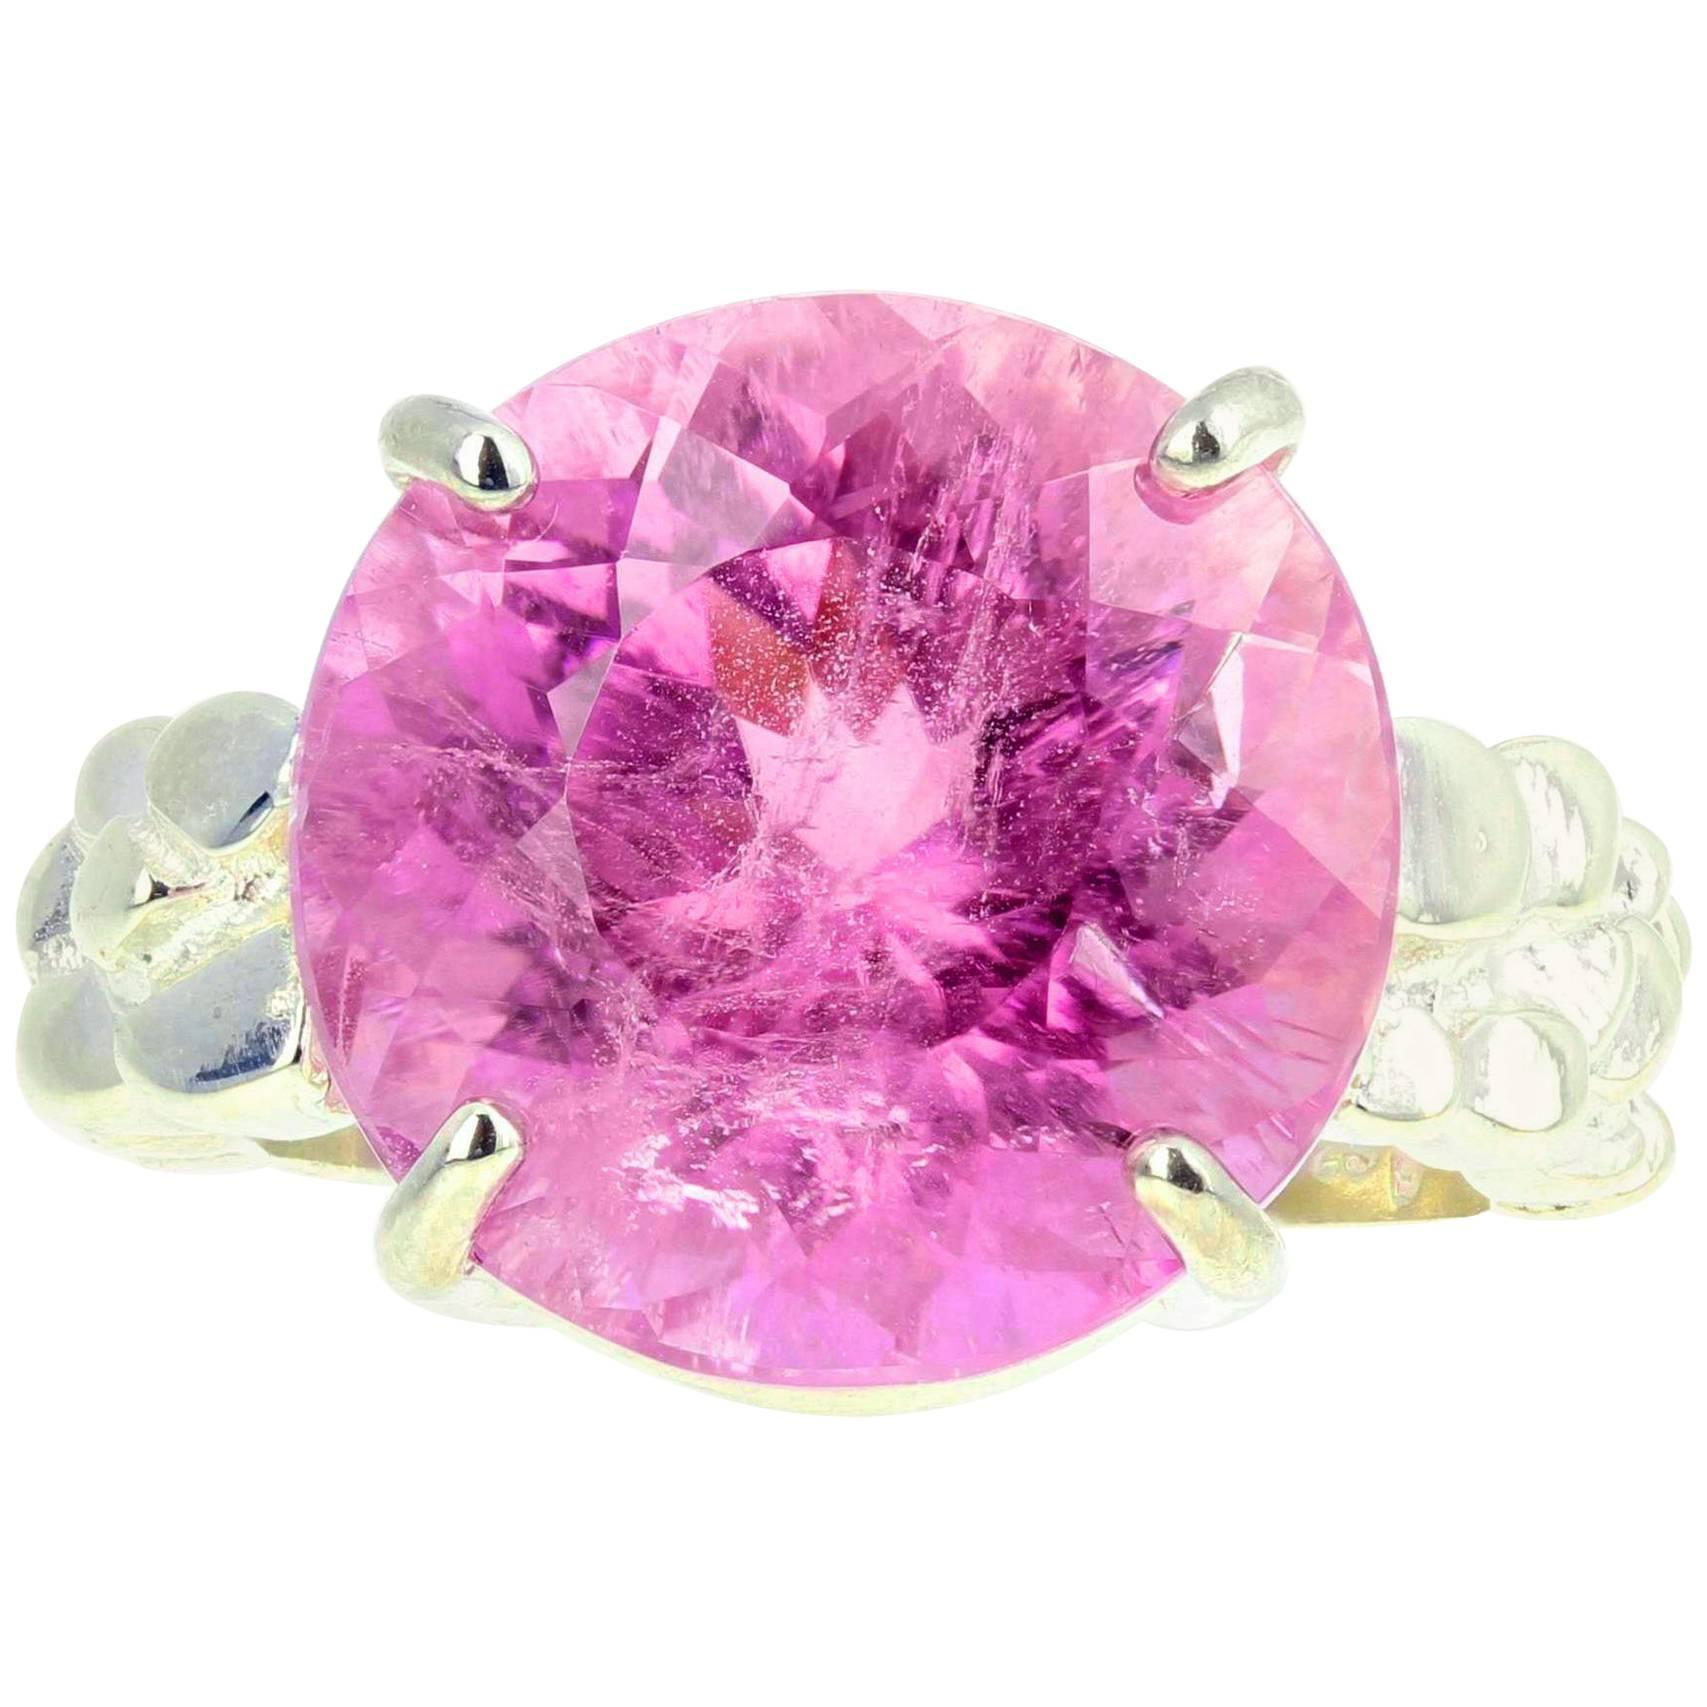 Gemjunky Extraordinary Sparkling 13.5Ct BrightPinky Kunzite Silver Cocktail Ring